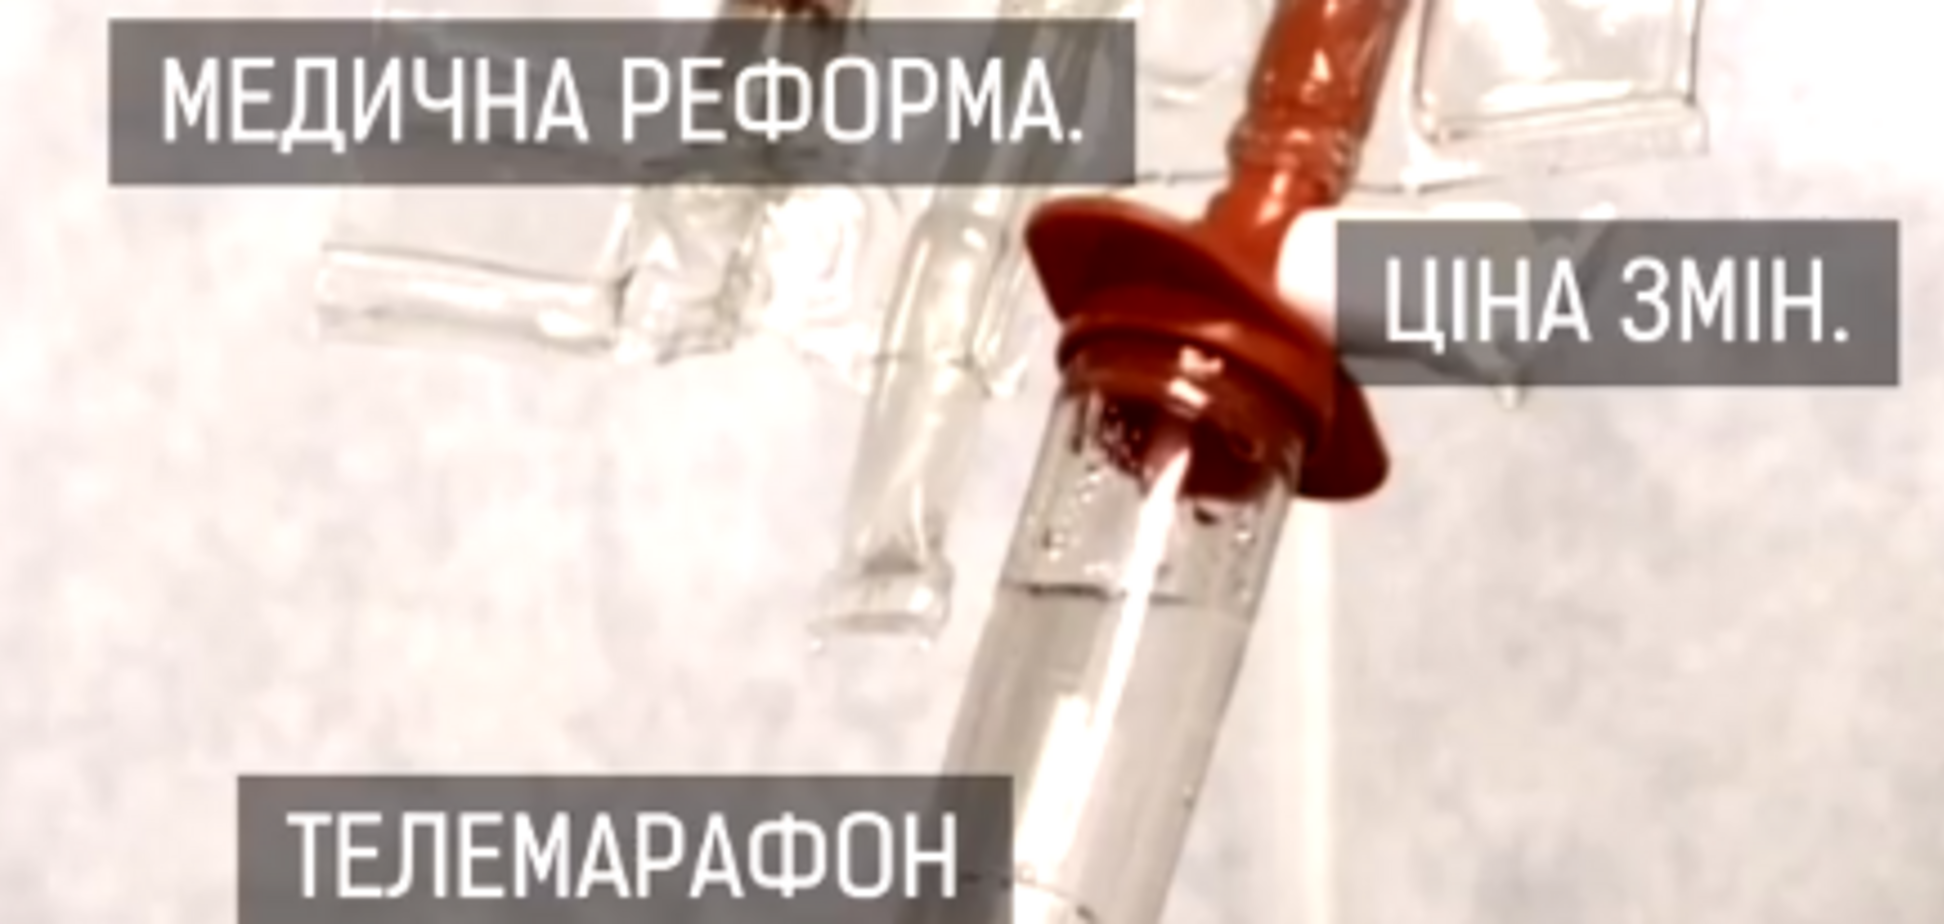 Телемарафон. Медична реформа